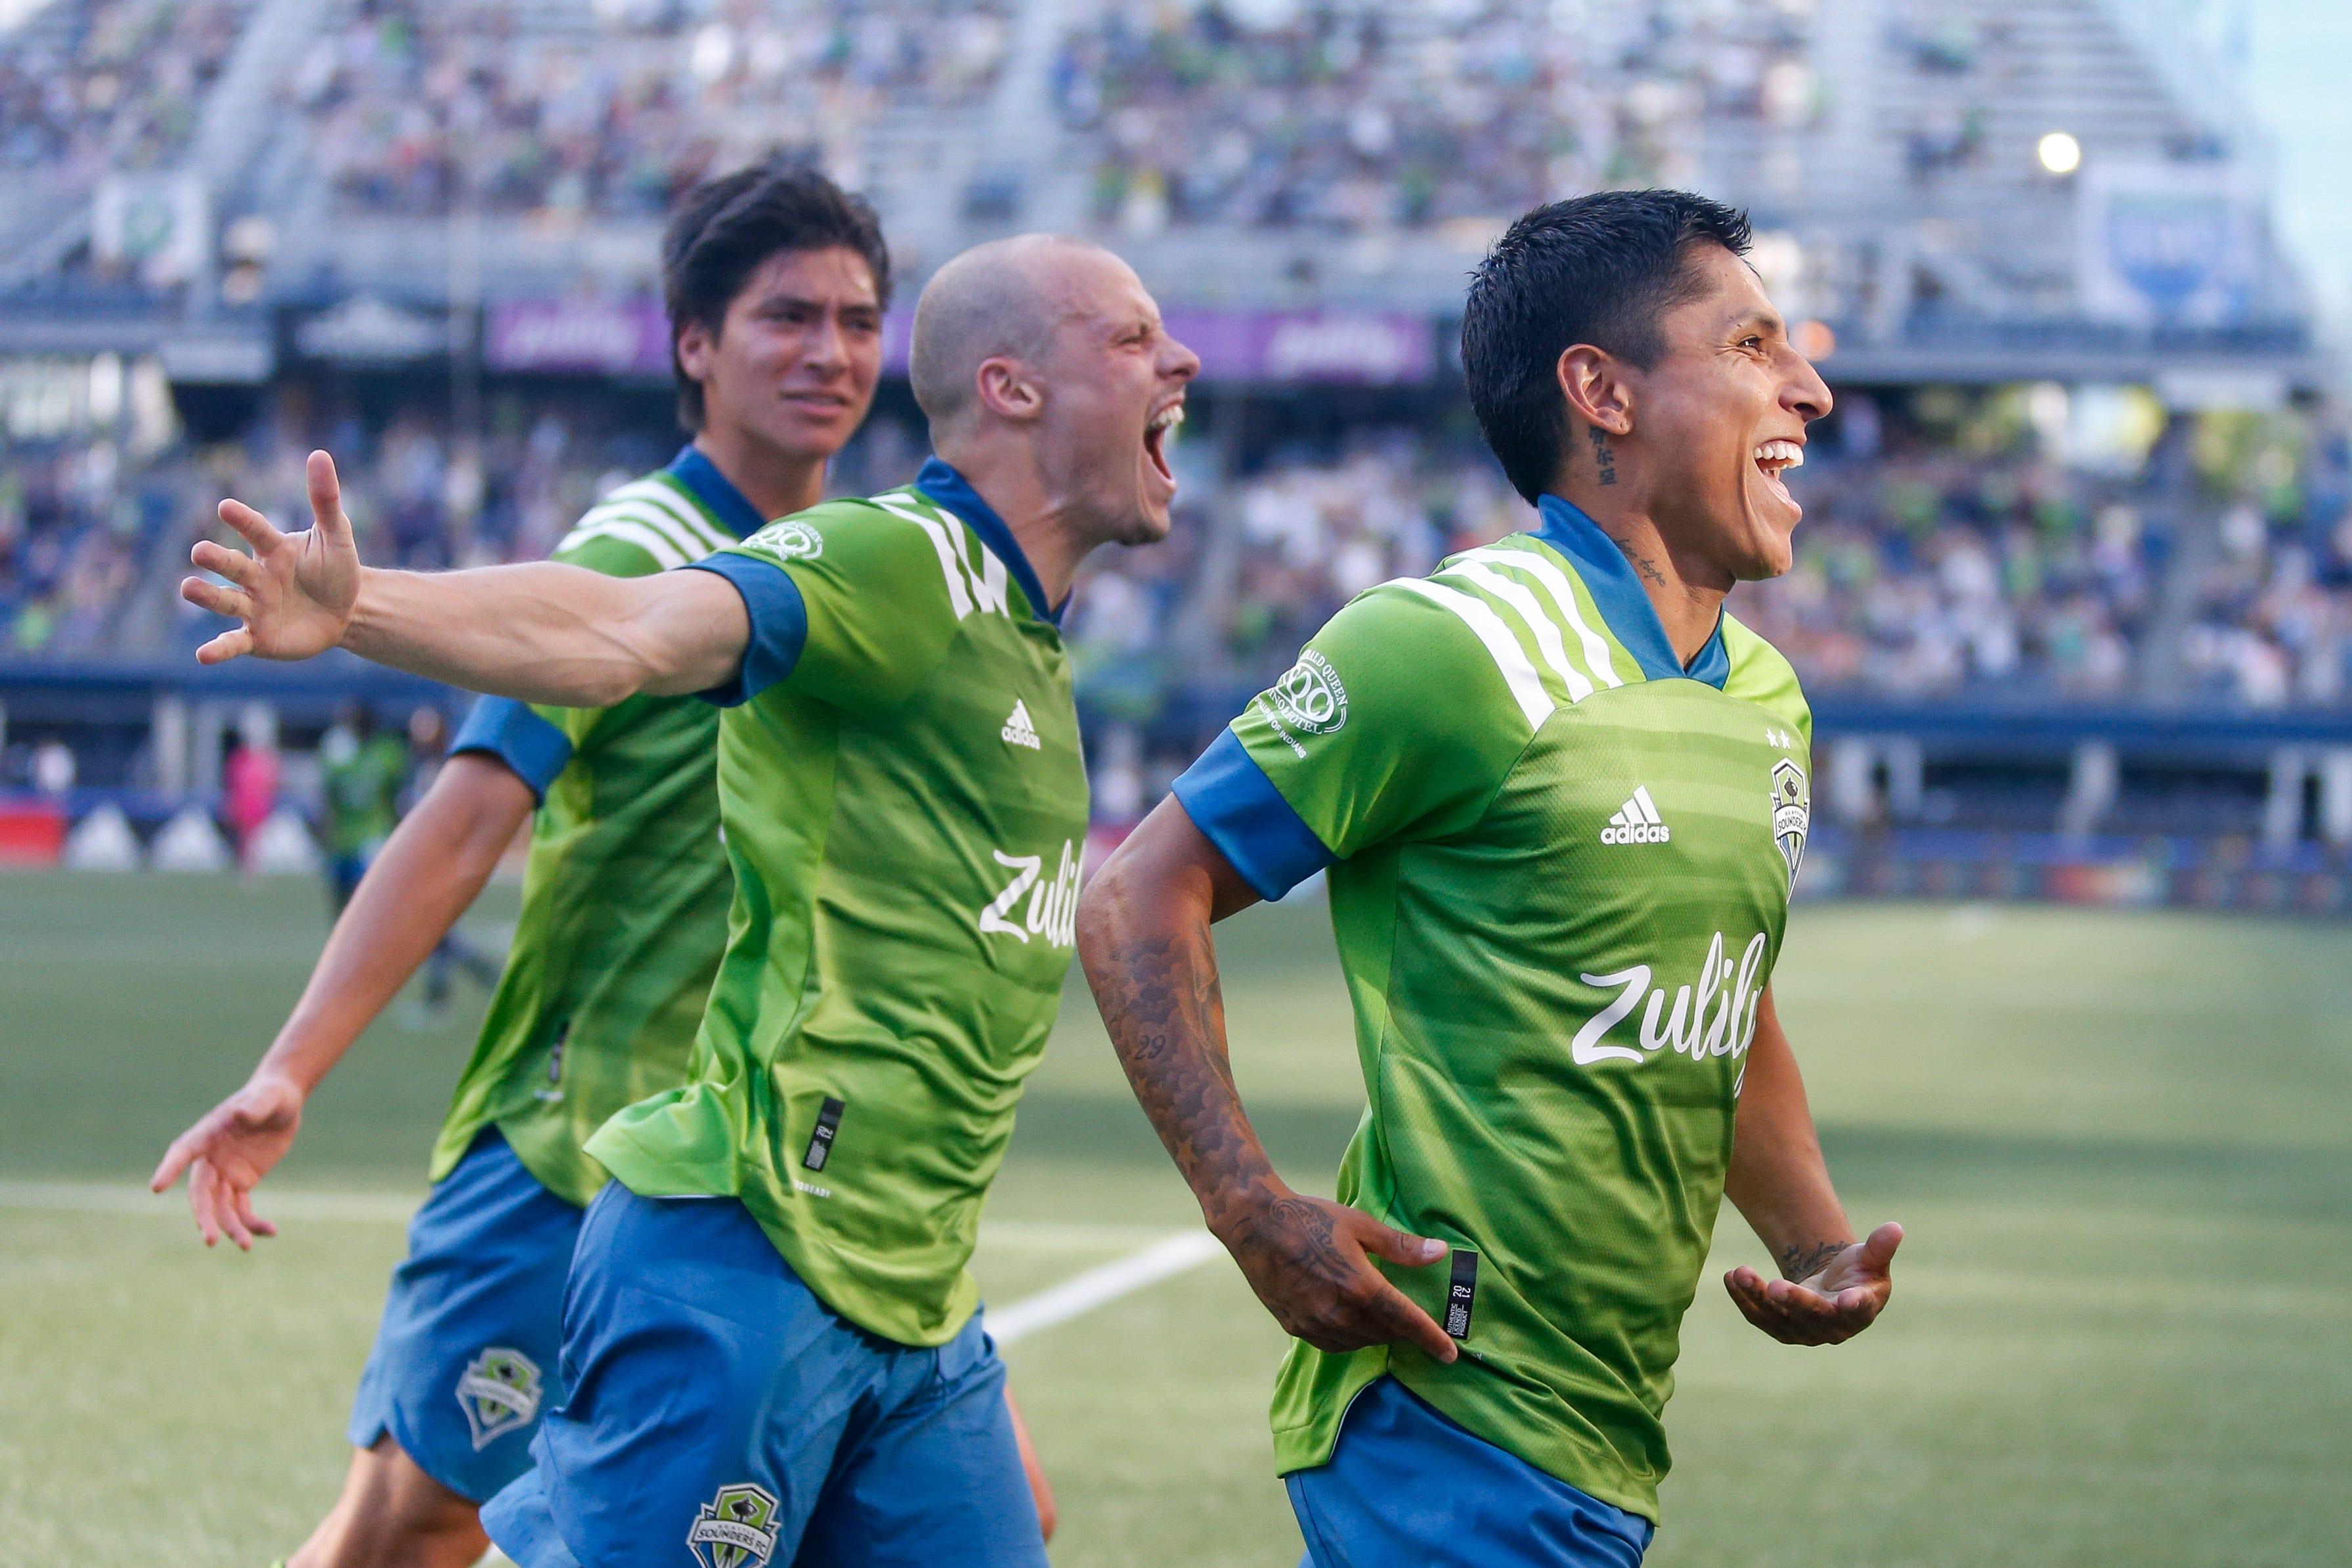 MLS weekend preview: Seattle Sounders remain unbeaten, Columbus Crew open Lower.com Field